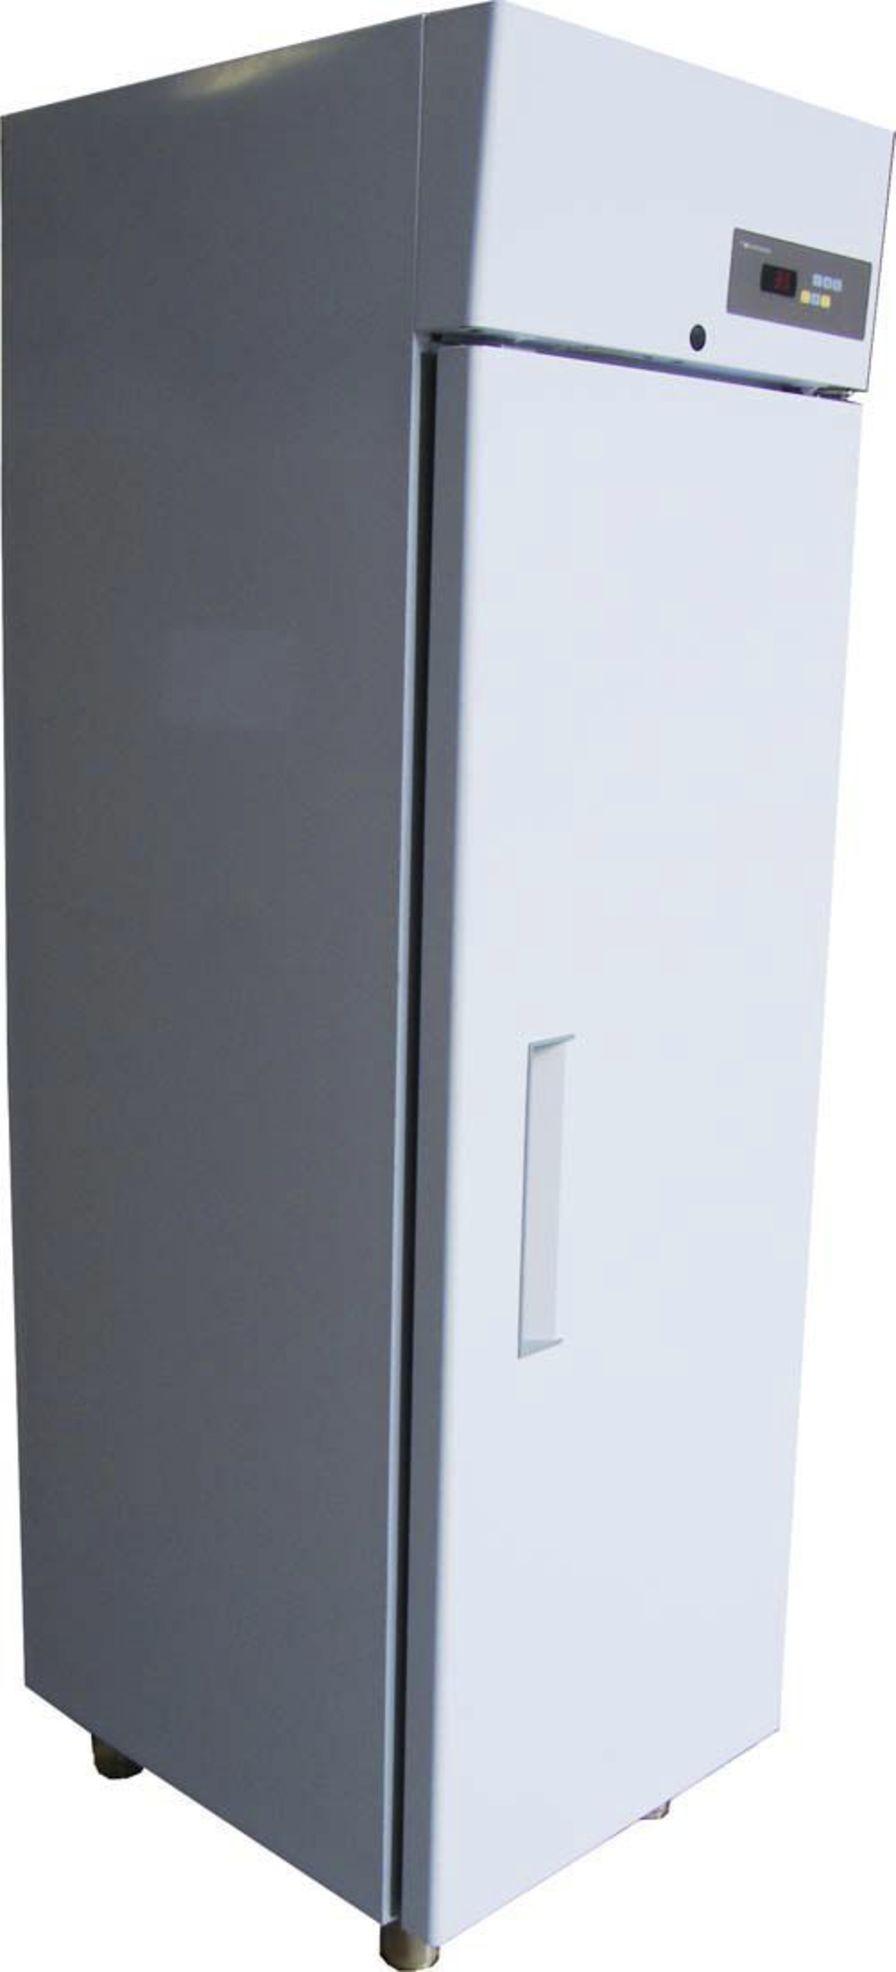 Cooling laboratory incubator / high-capacity / stainless steel CI series IKS International